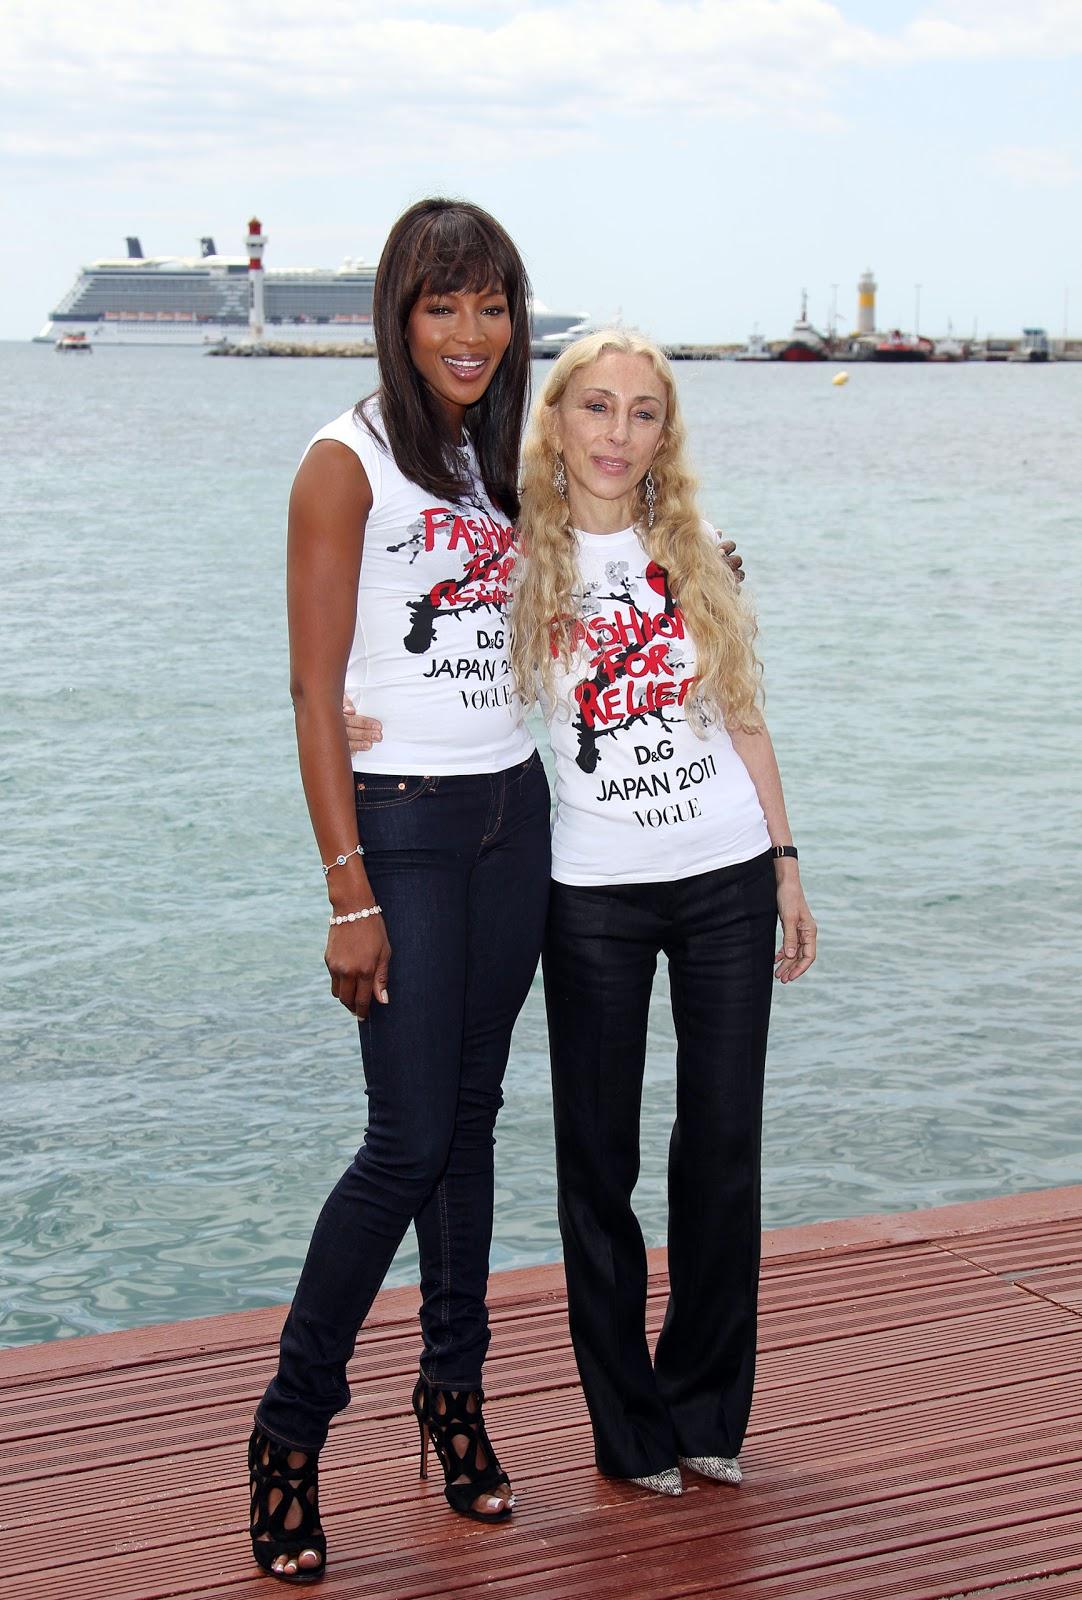 http://4.bp.blogspot.com/-DV3Hk0PmWyc/TdtzWdGIw-I/AAAAAAAAFQs/KBRwgMDlVVs/s1600/fashion_for_relief_07_wenn3342203.jpg